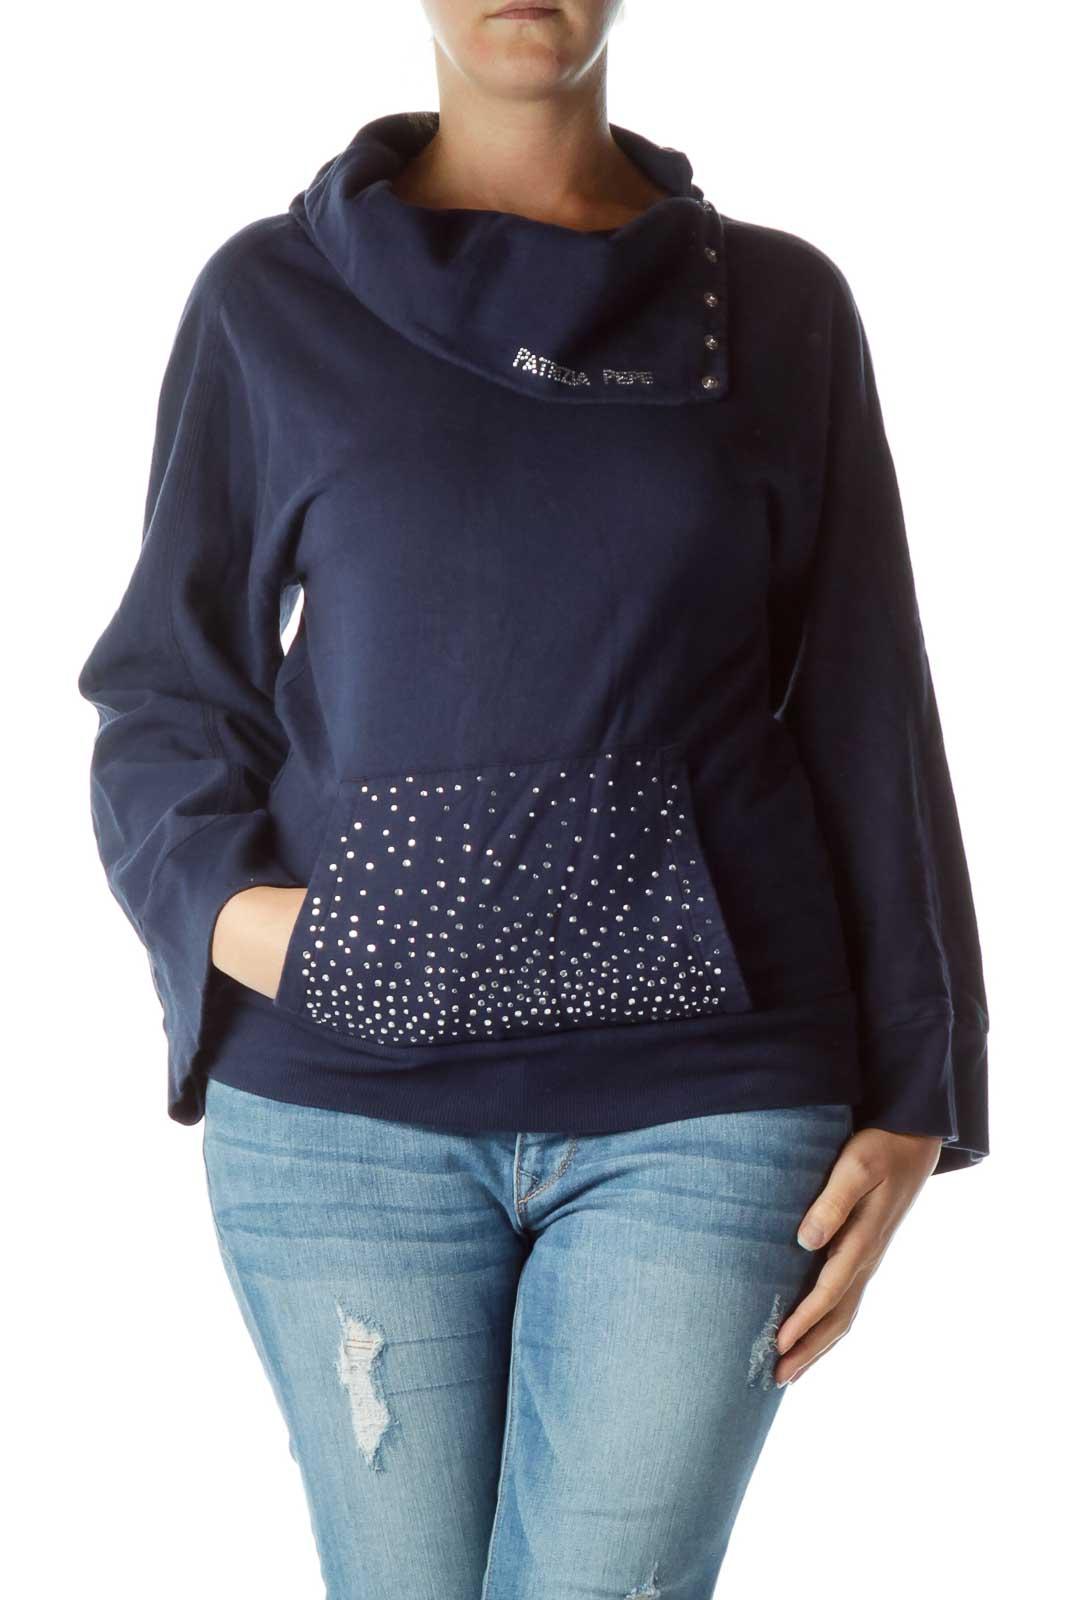 Navy Silver Gemstone Sweater Front